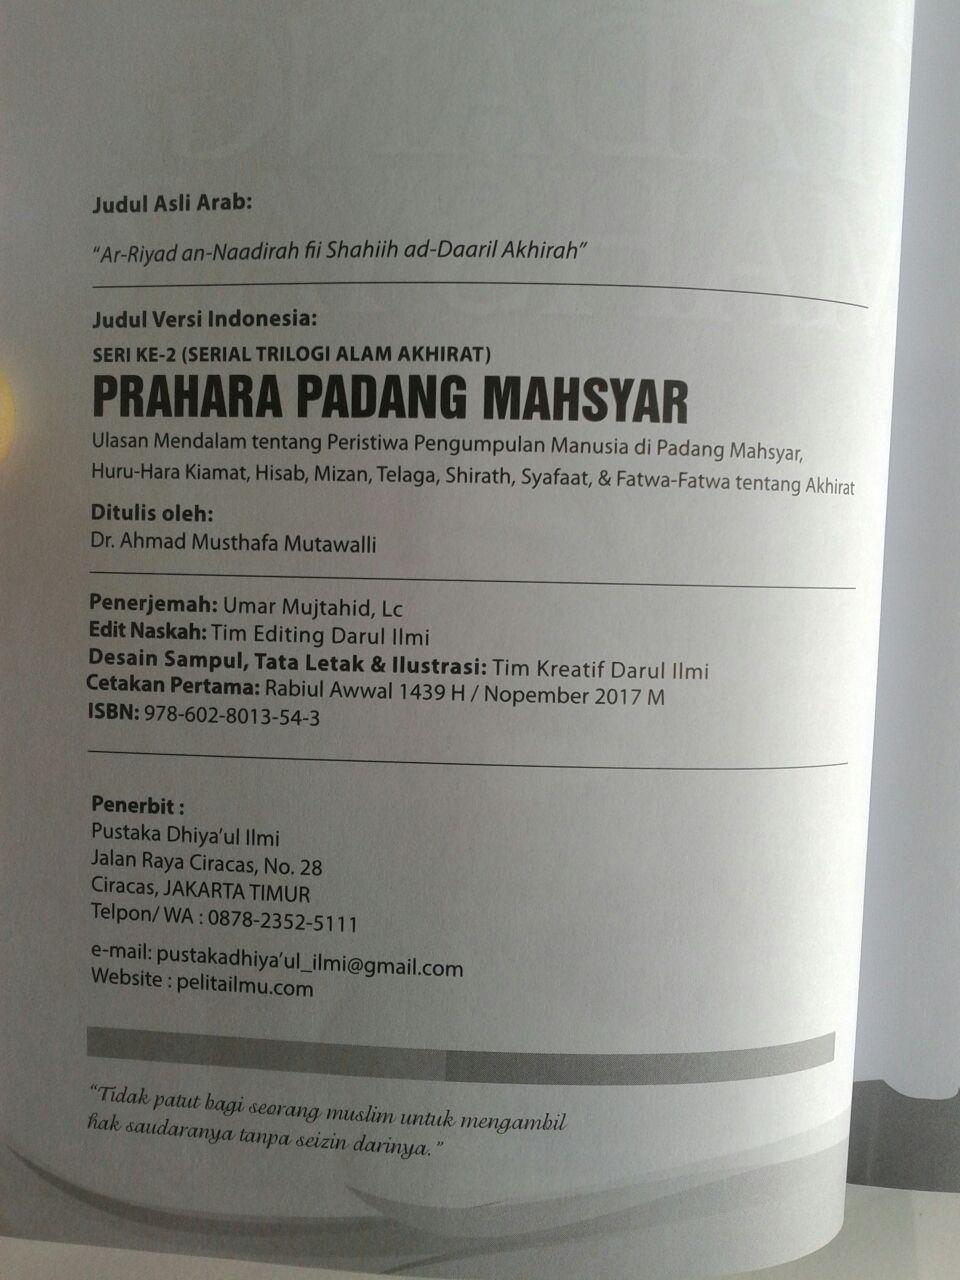 Buku Prahara Padang Mahsyar (Seri 2 Trilogi Alam Akhirat) isi 3